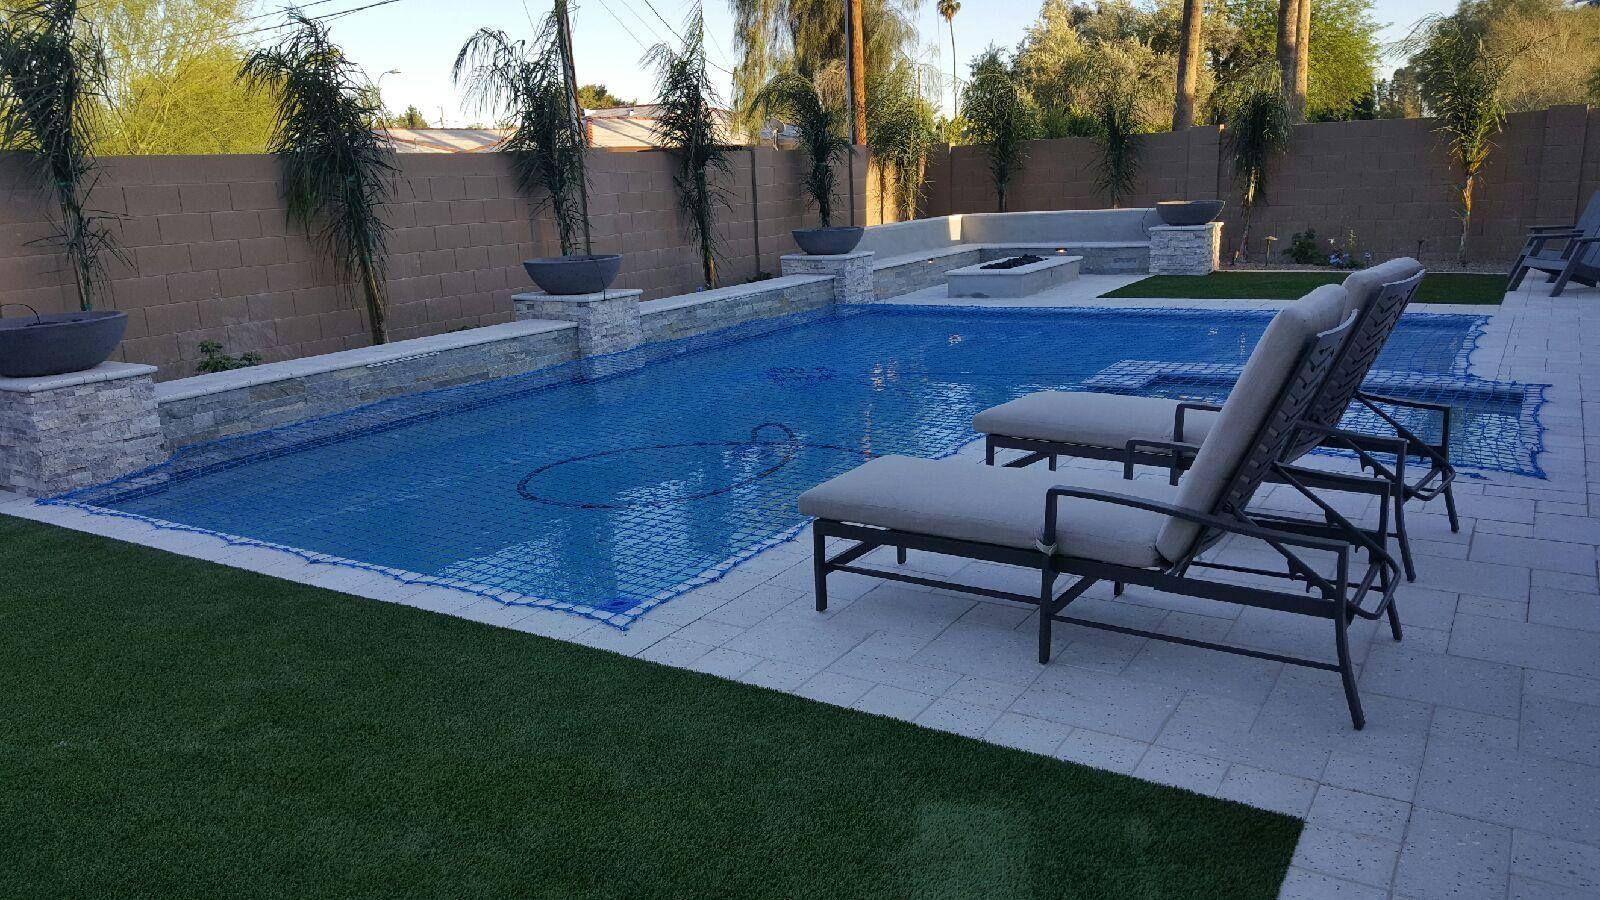 Pool Safety Nets Pool Net Covers Arizona Pool Fence Pool Nets Pool Pool Safety Net